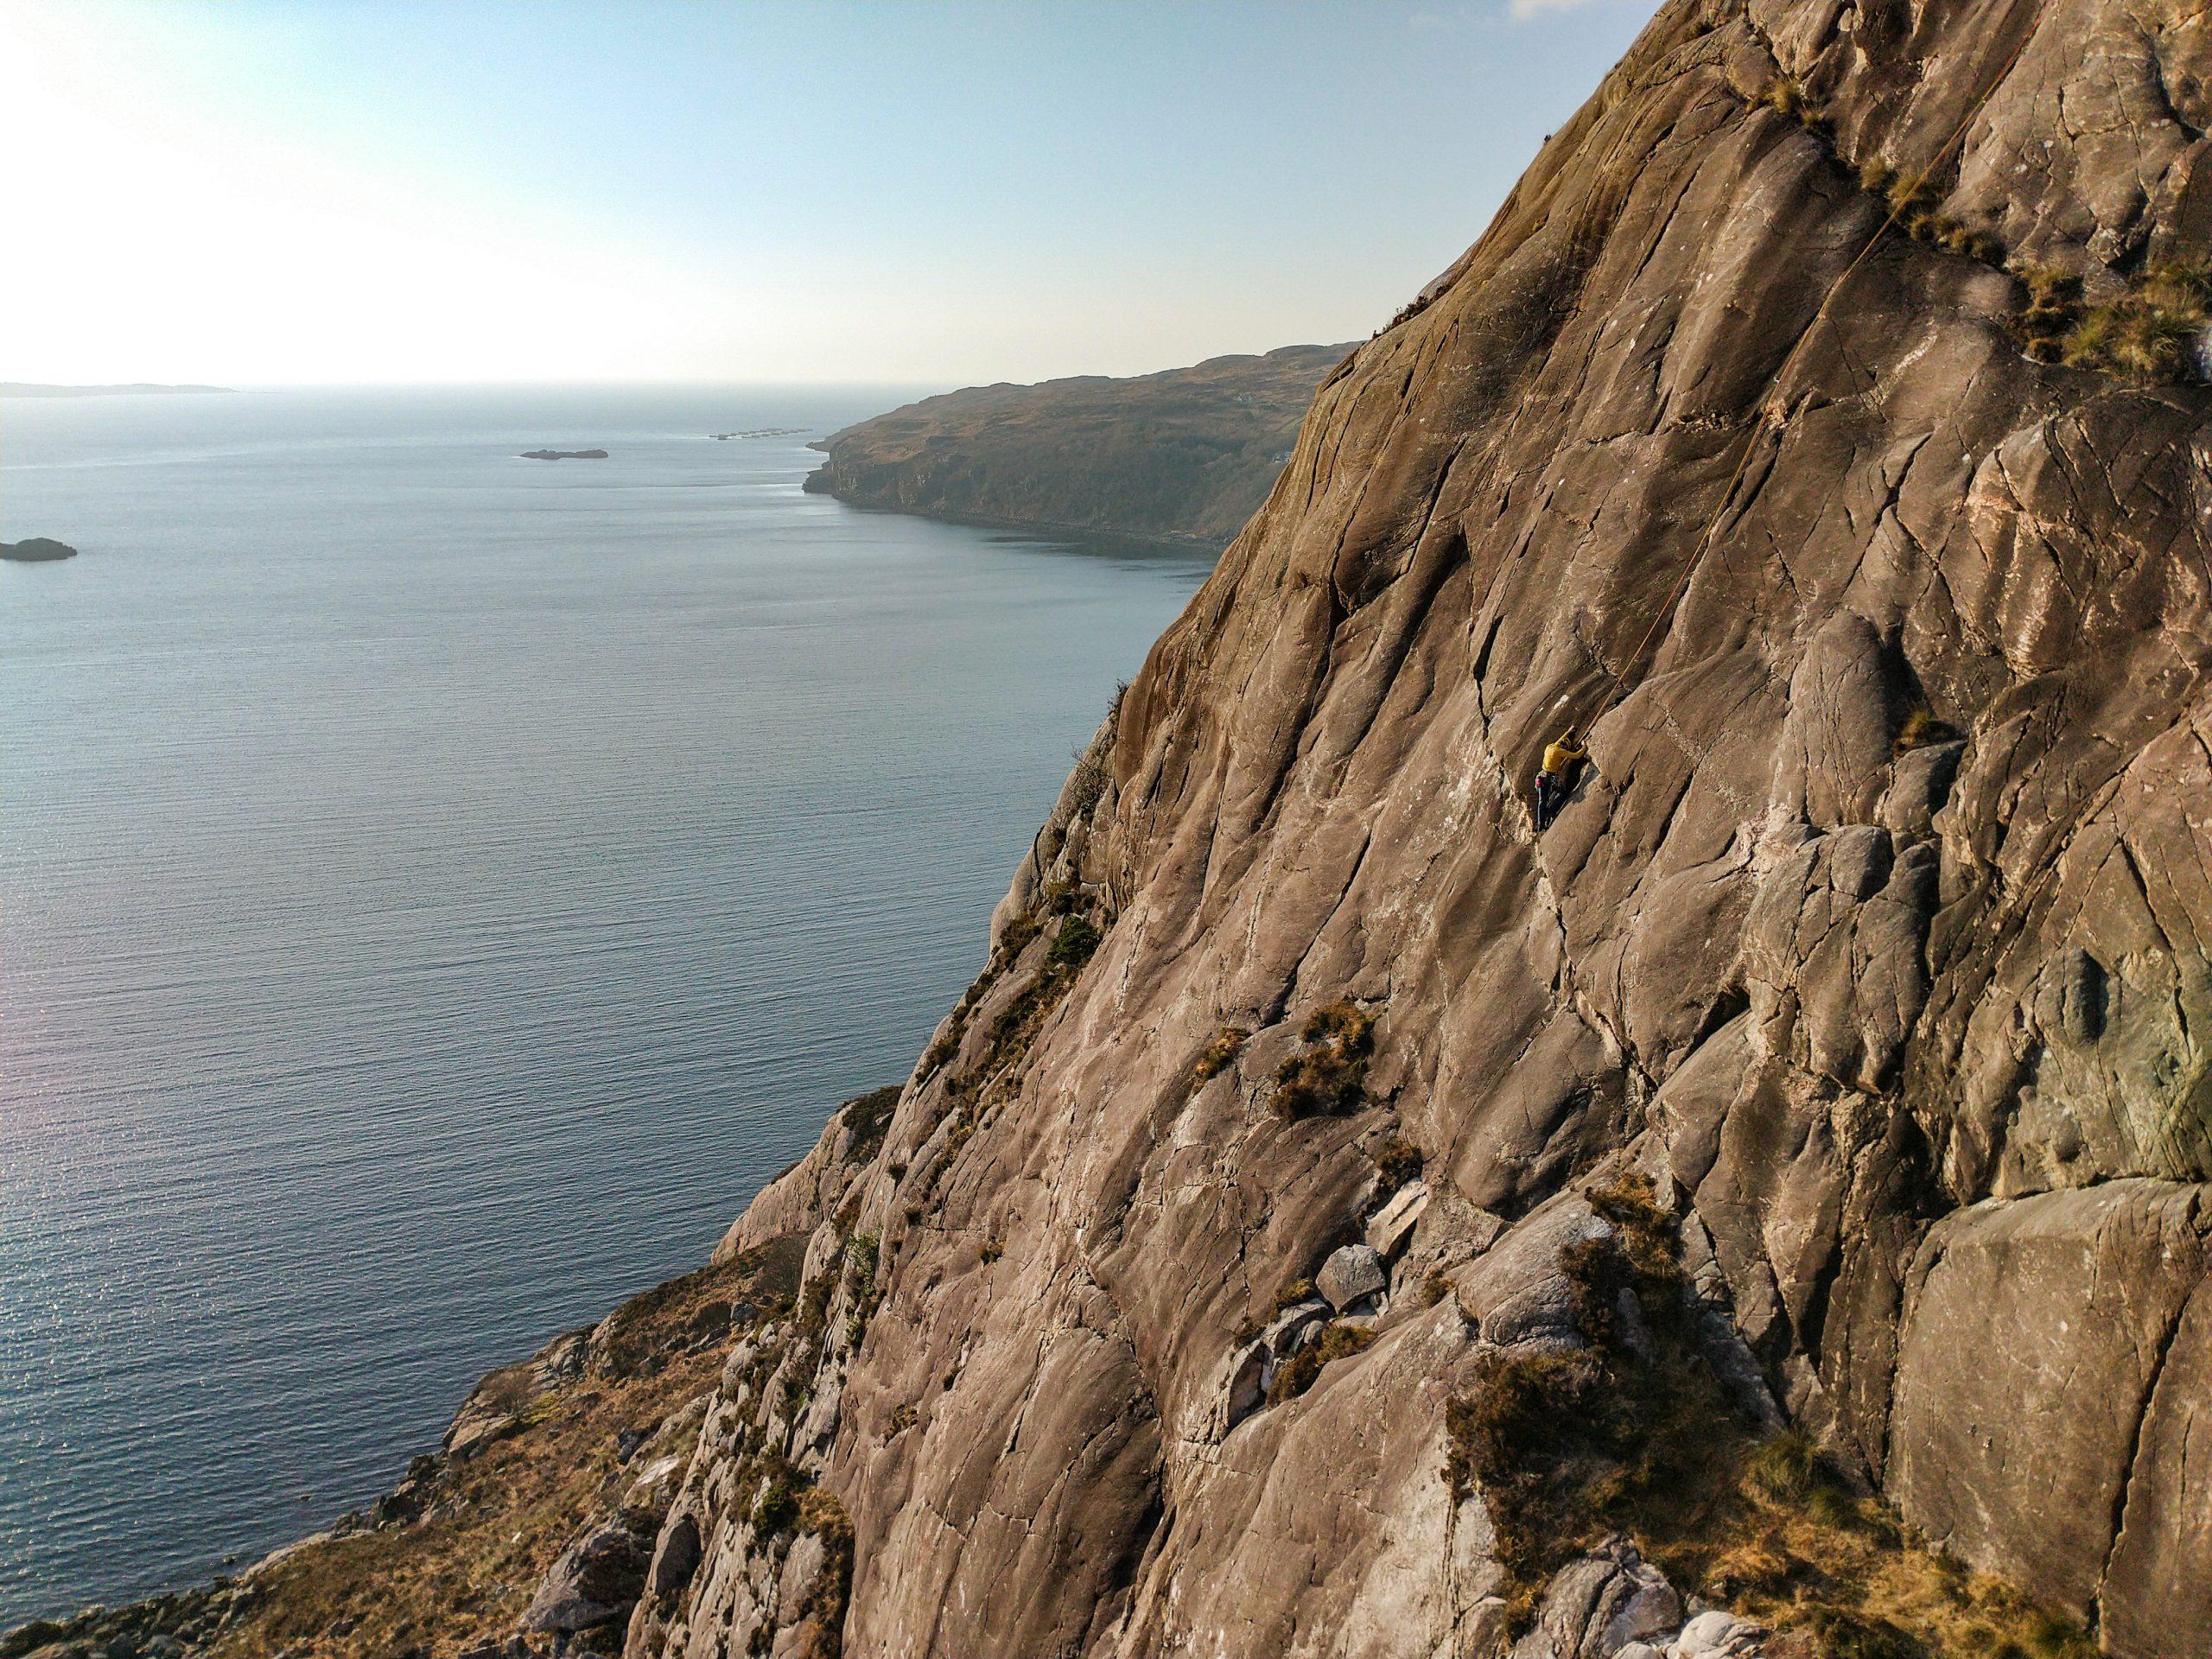 Multi-pitch rock climbing at Diabaig